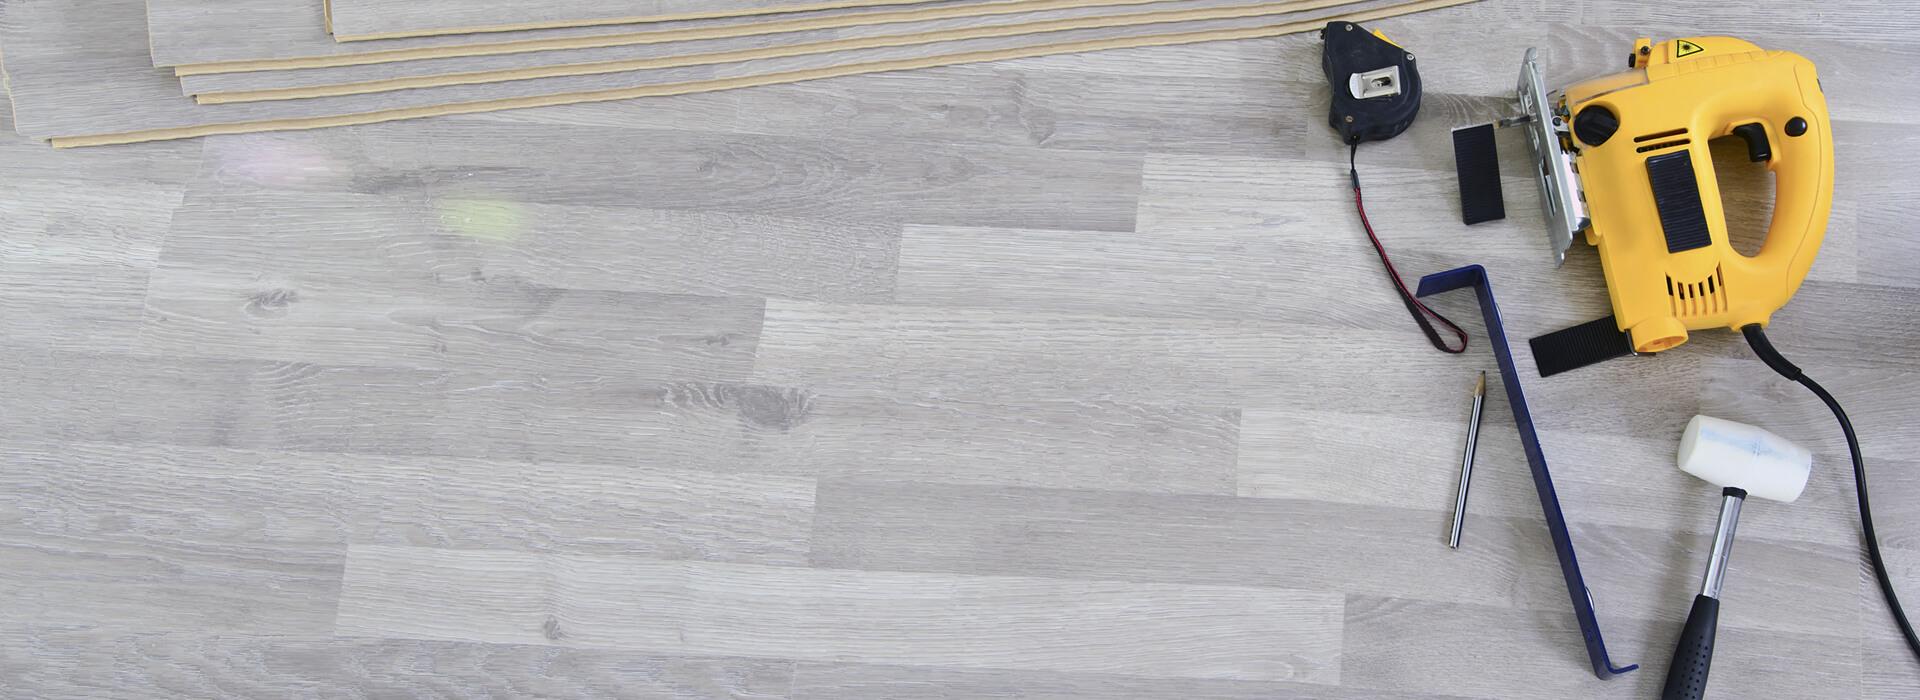 Professional Flooring Preparation